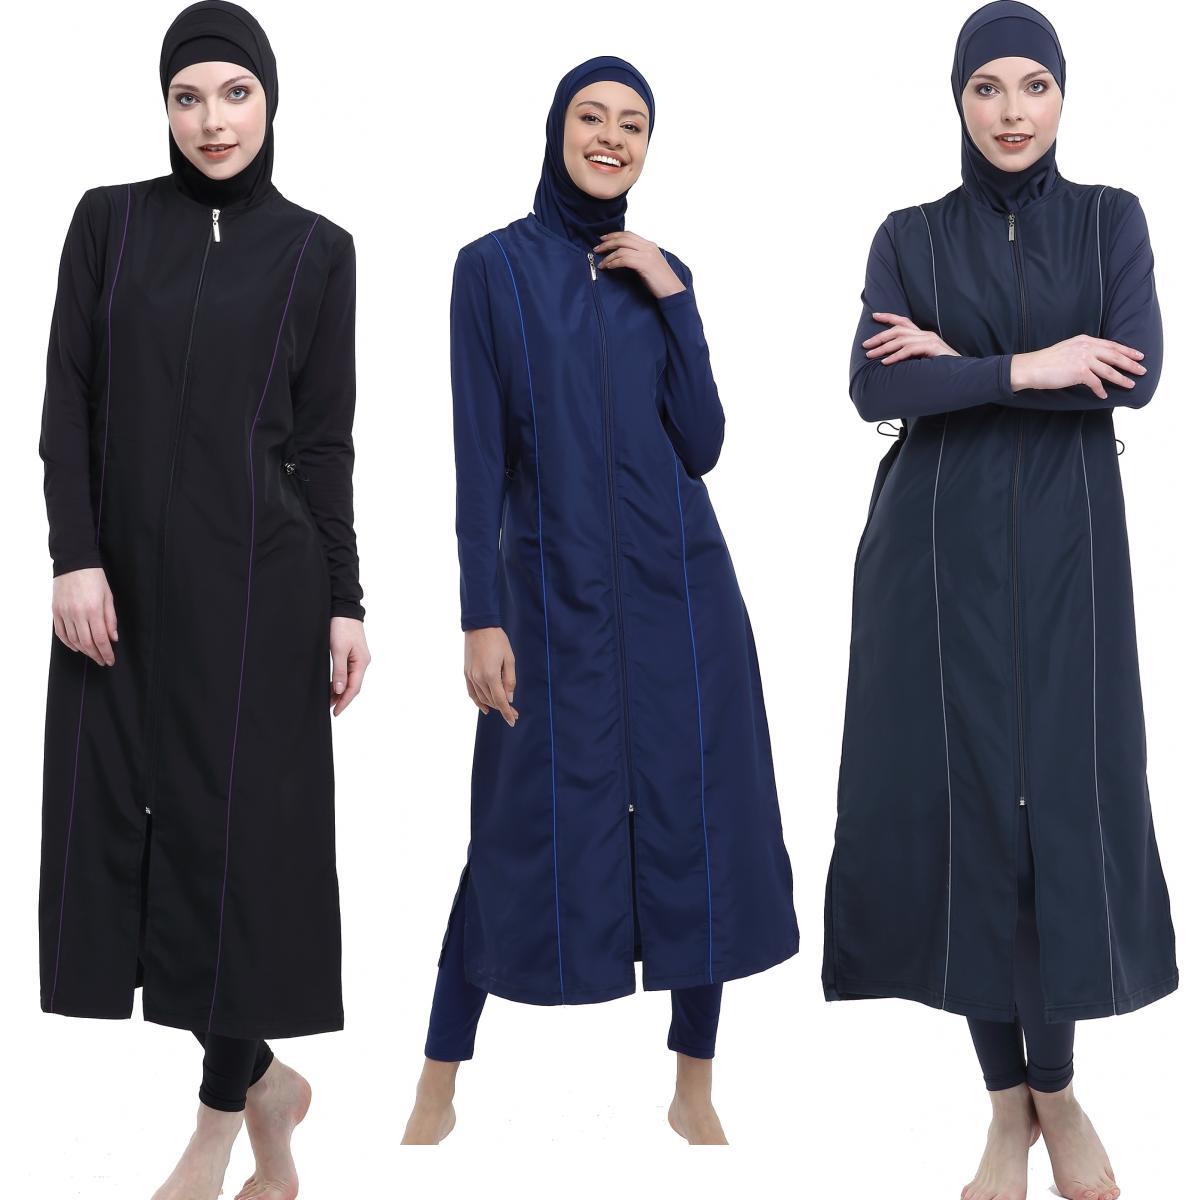 Argisa 7119 Piping Long Hijab Swimwear S-XXL Muslim Hijab Islamic Swimsuit Swim Burkinis Full Cover